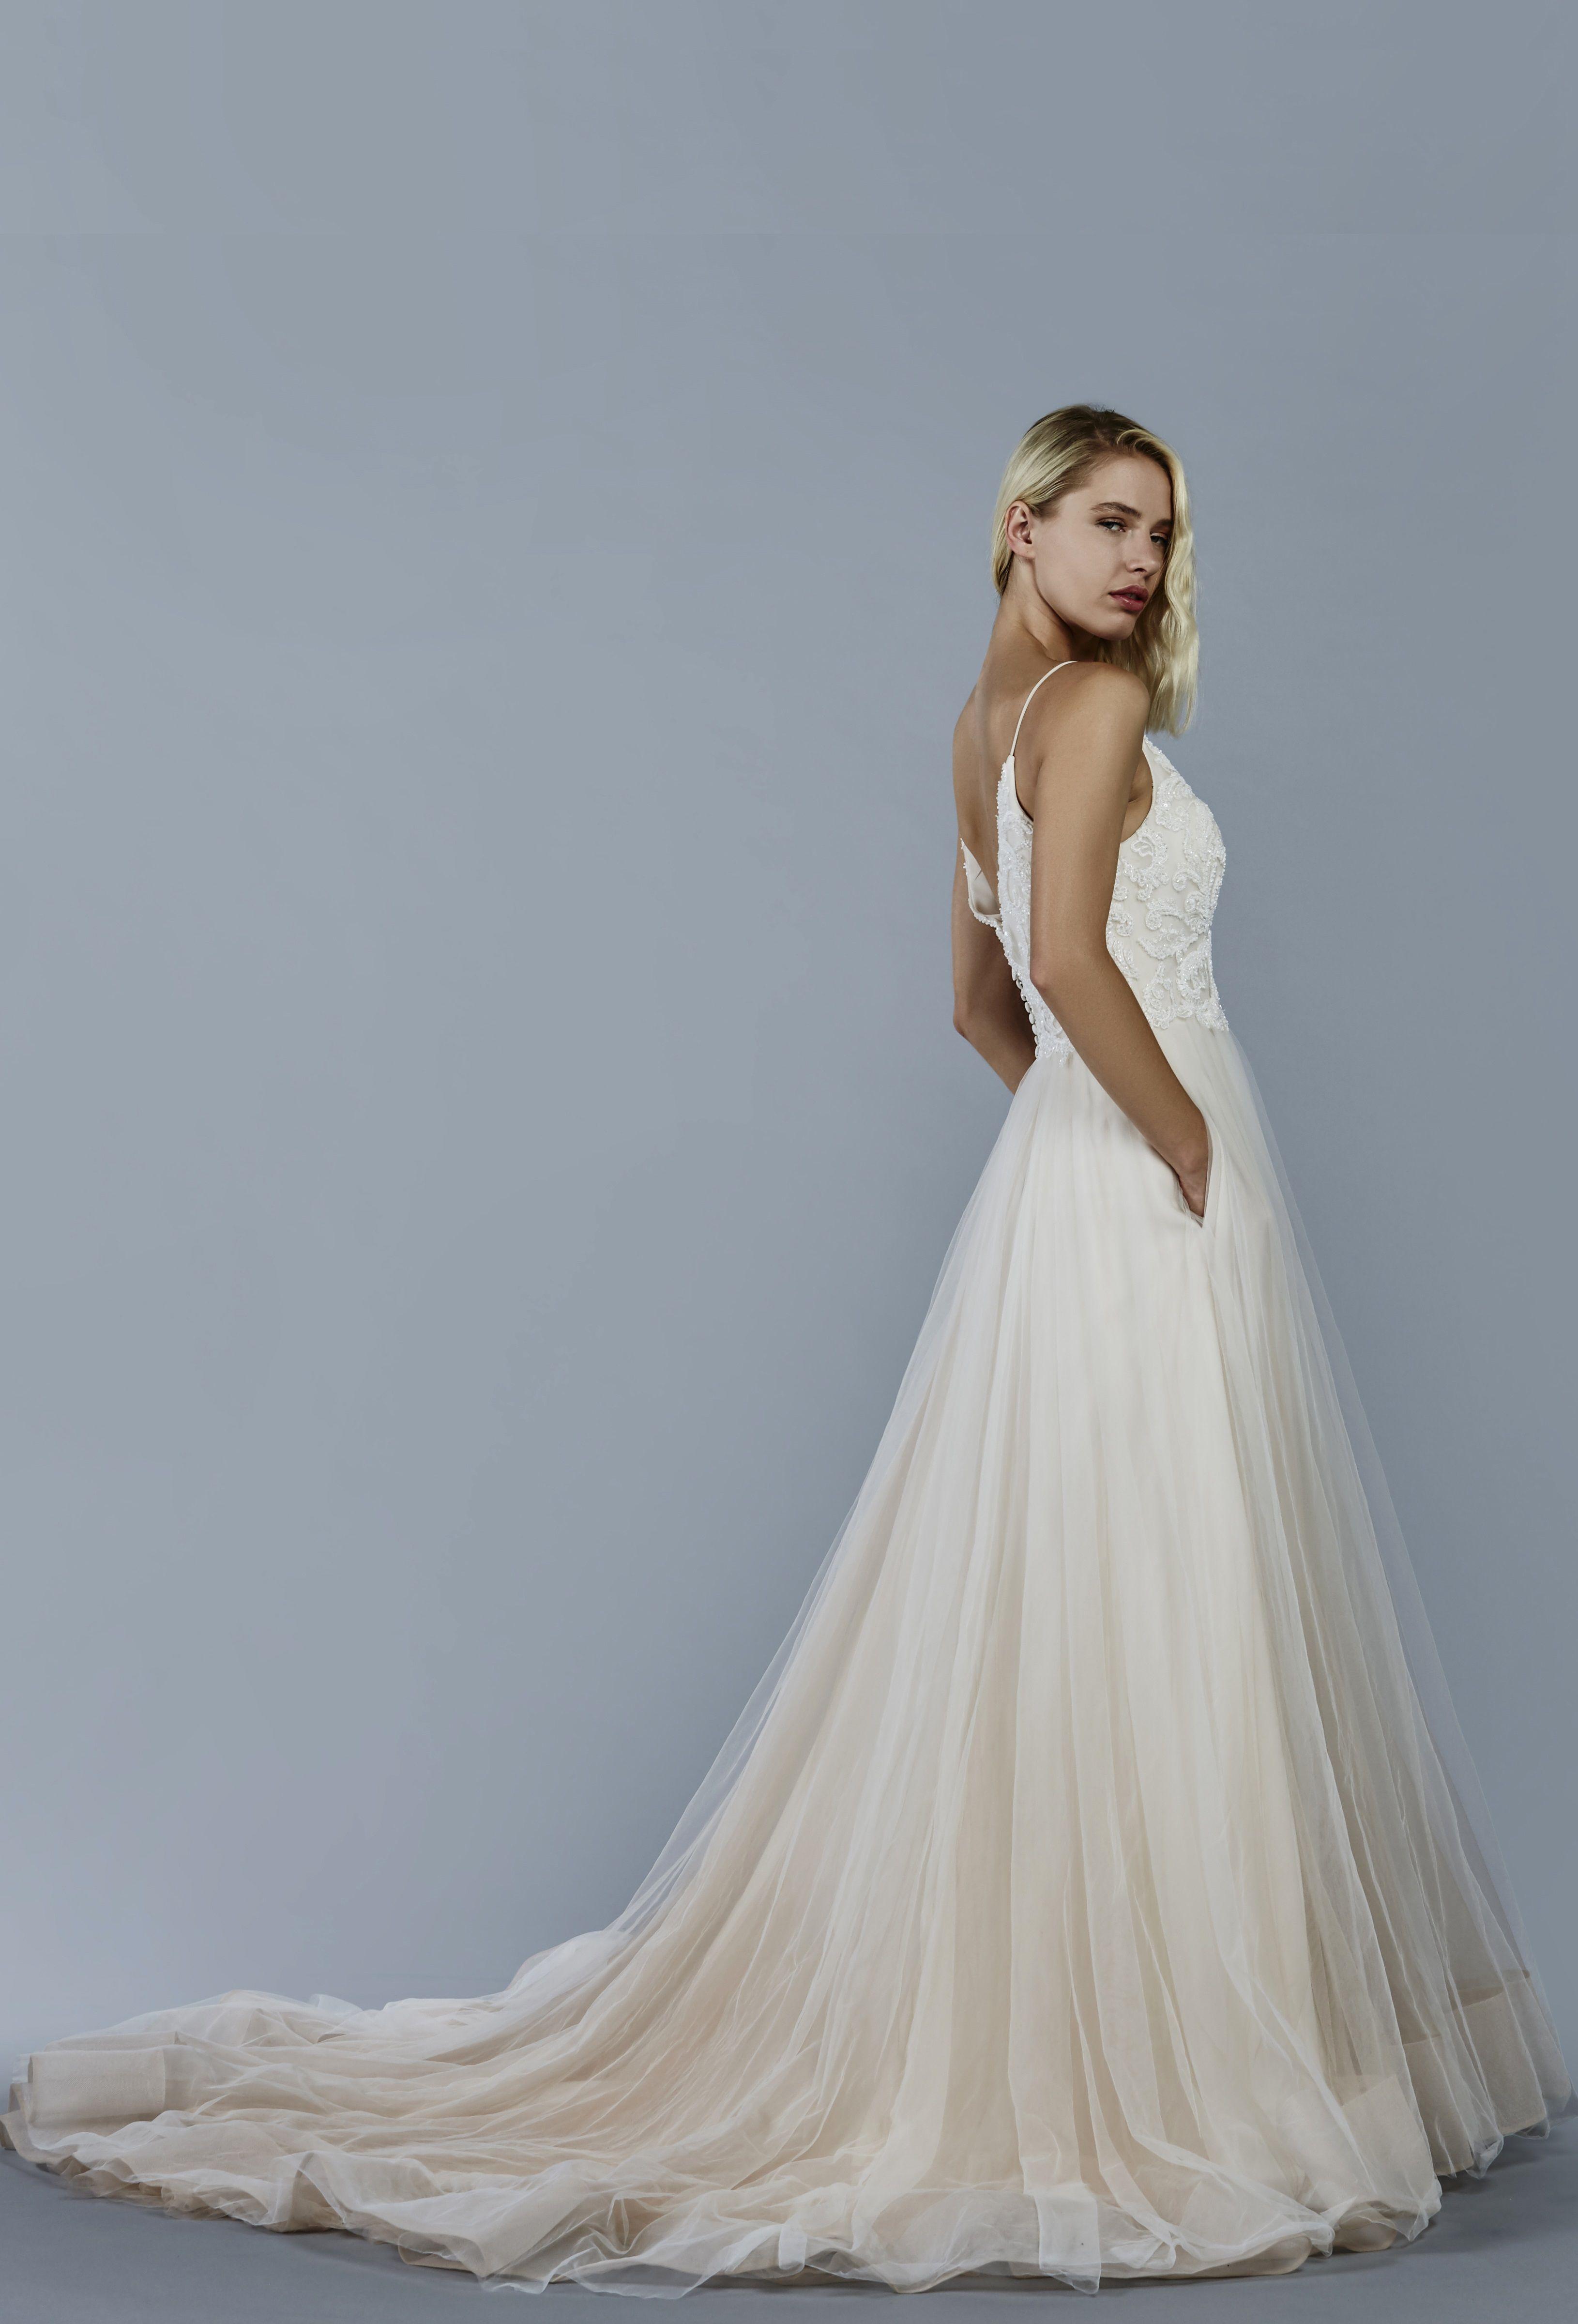 Star wedding dress by Kelly Faetanini in Blush // Pearlescent ...